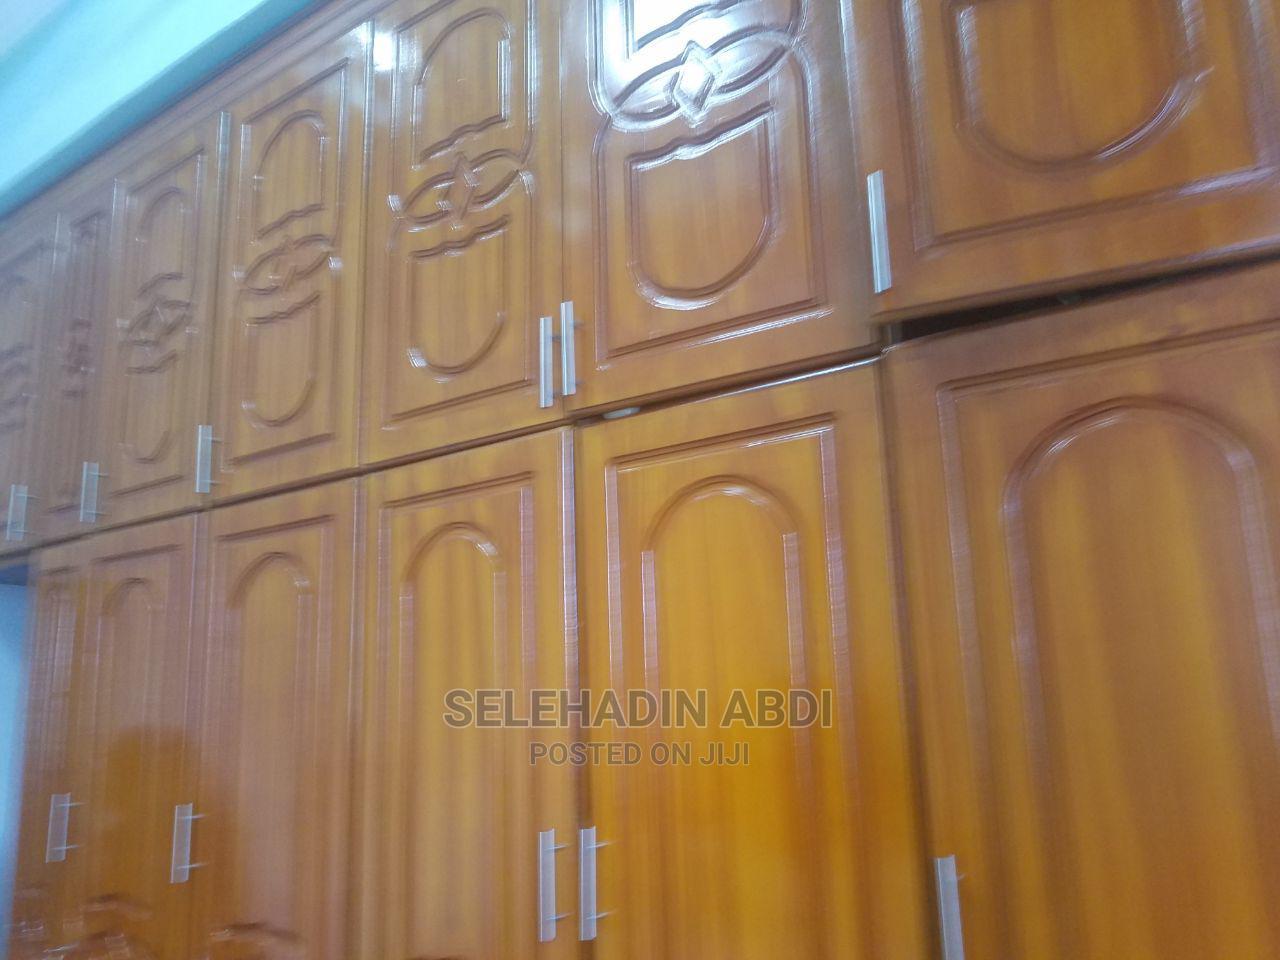 Furnished 5bdrm House in ዱከም, East Shewa for Sale   Houses & Apartments For Sale for sale in East Shewa, Oromia Region, Ethiopia